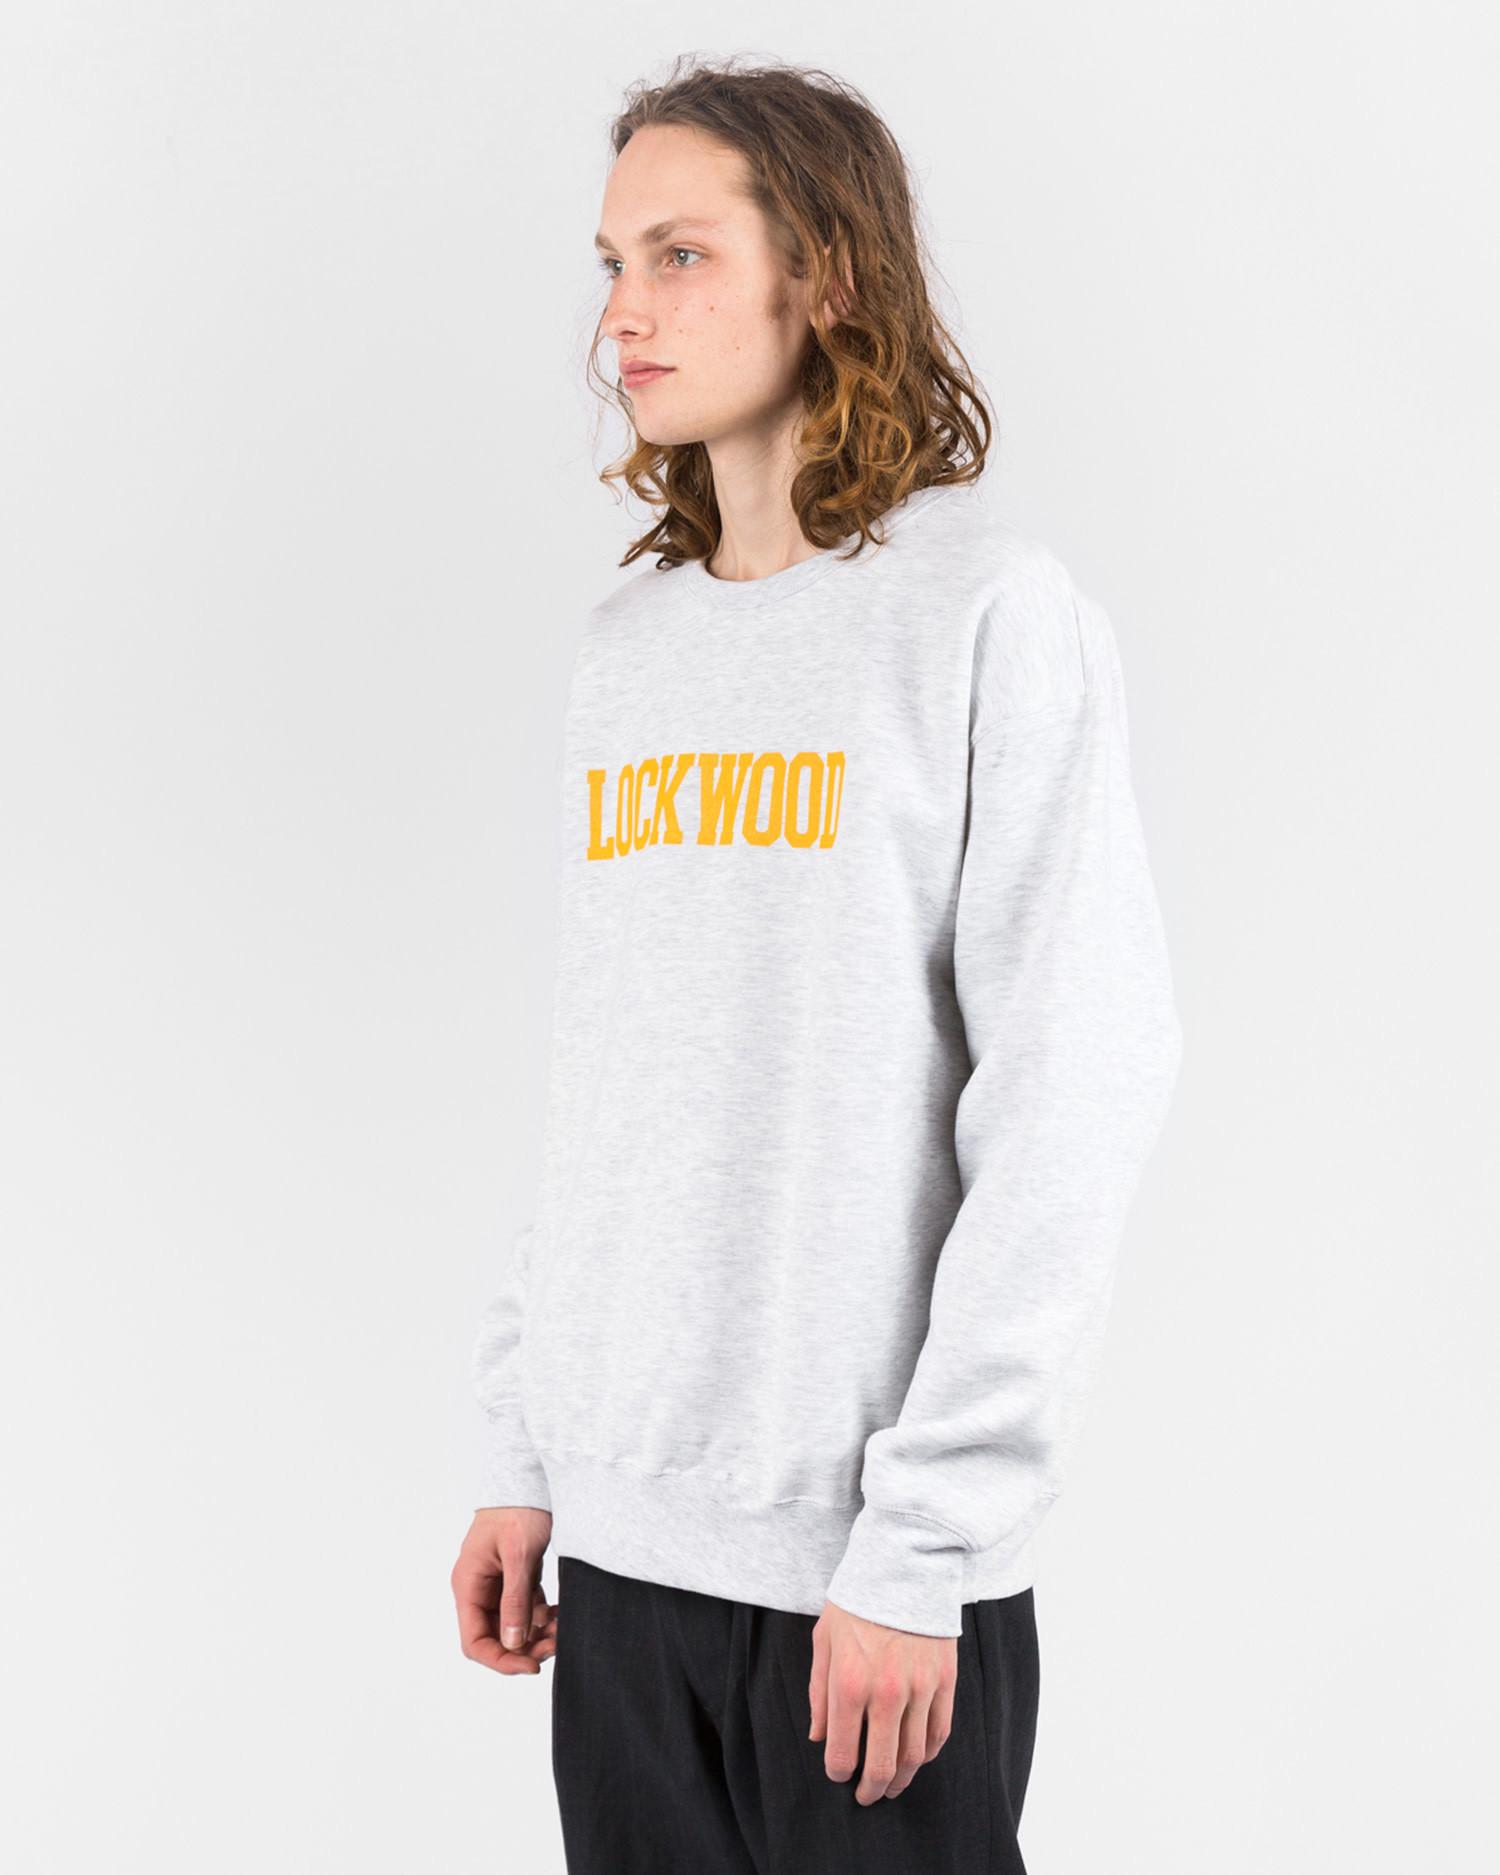 Lockwood OG Varsity Crewneck Grey/Yellow